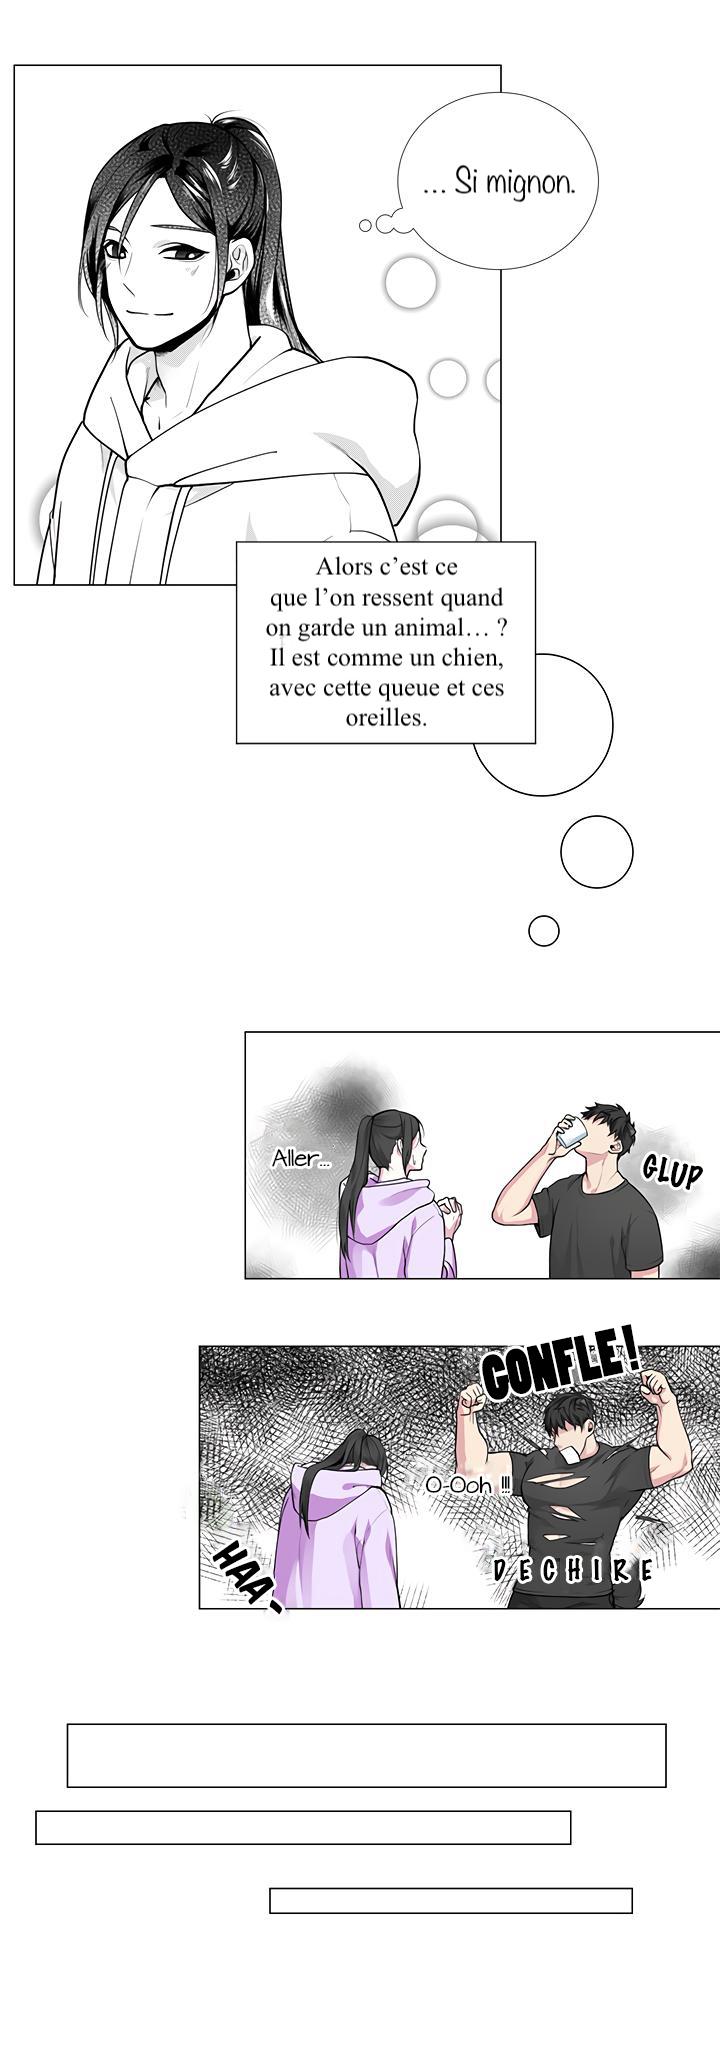 https://nine.mangadogs.com/fr_manga/pic2/59/11515/518618/28b60a16b55fd531047c0c958ce14b95.jpg Page 7